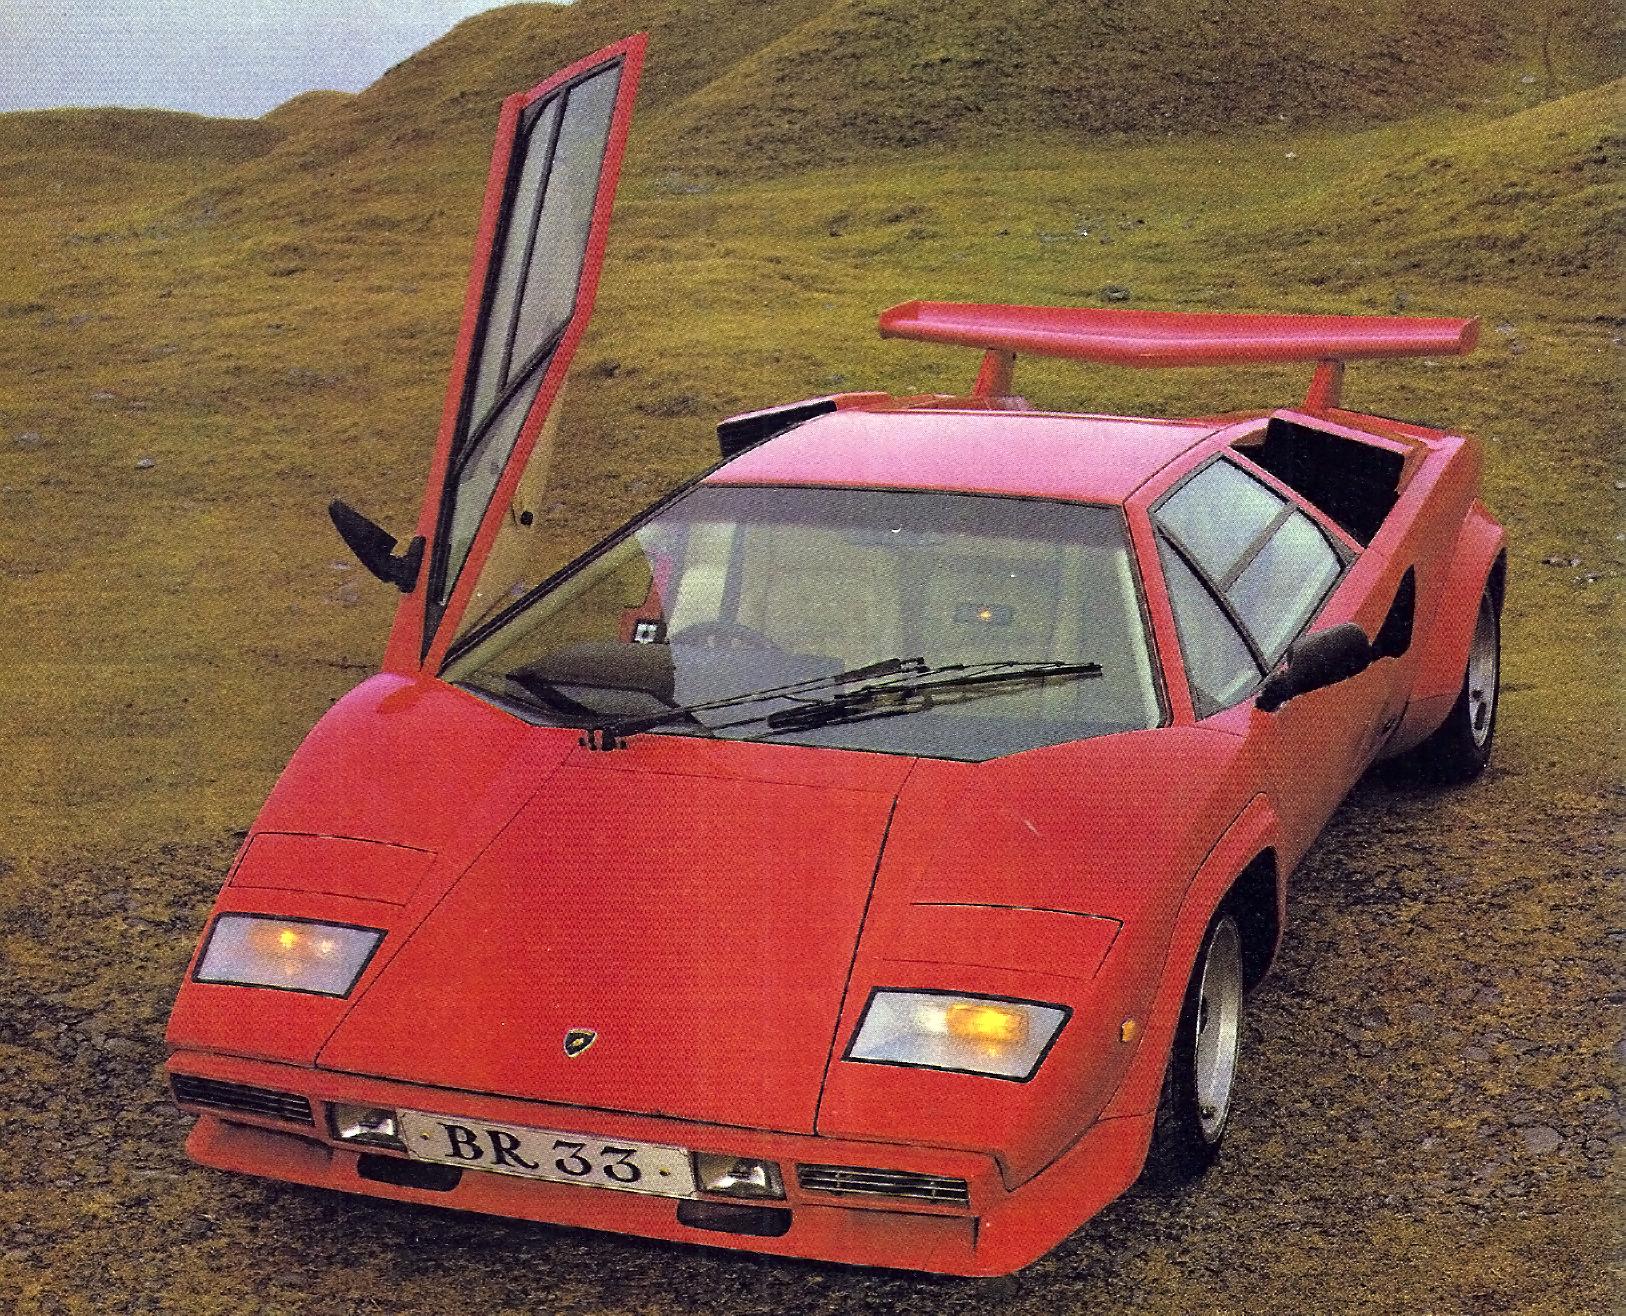 Lamborghini-Countach Breathtaking Lamborghini Countach Owners Manual Pdf Cars Trend